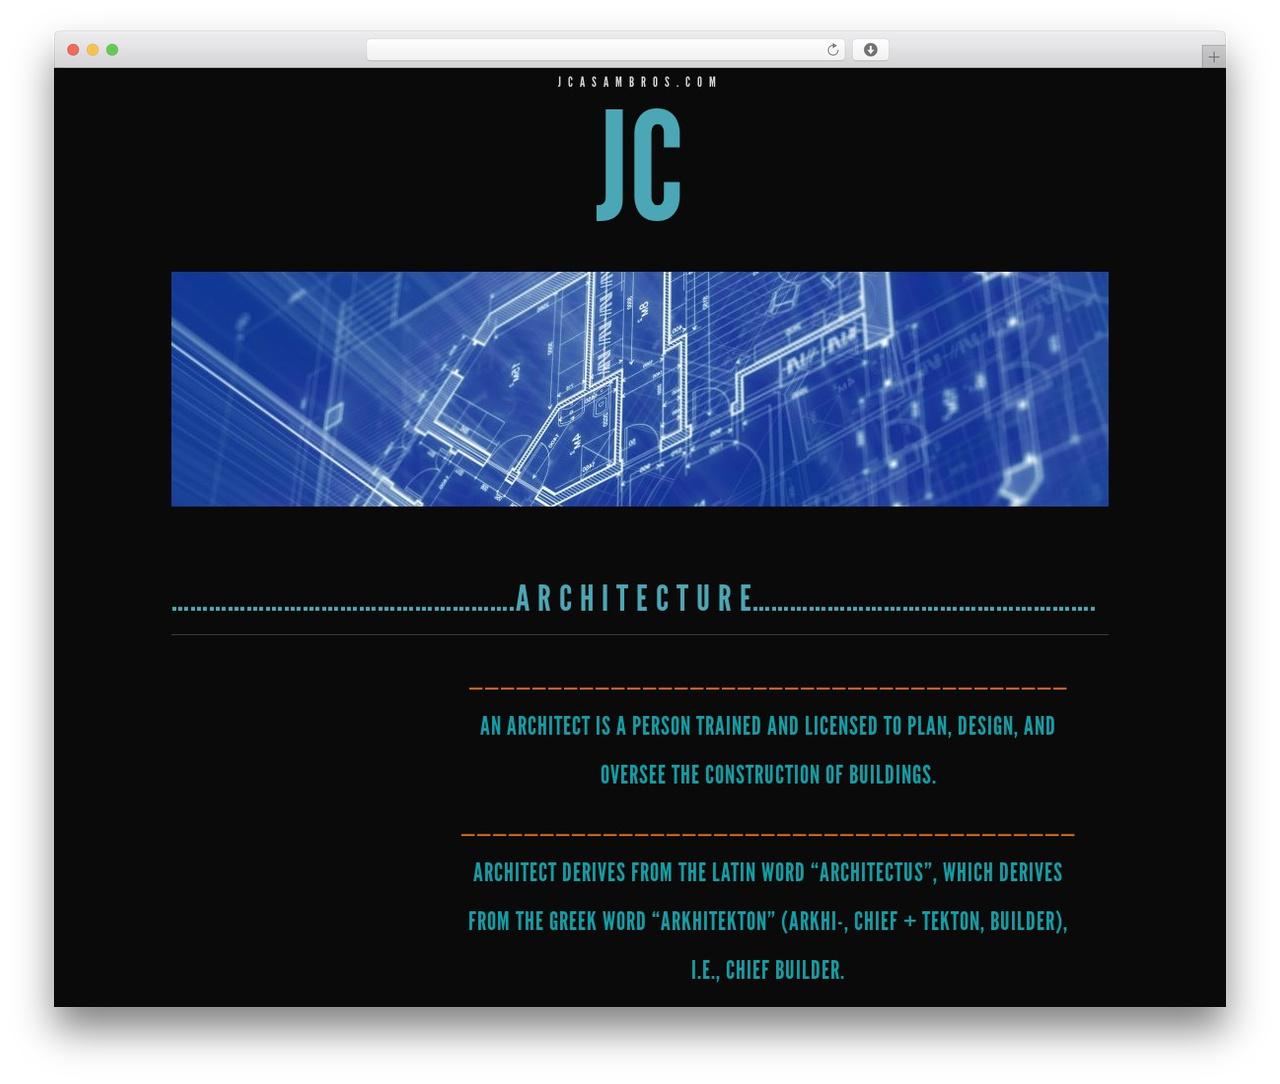 Trvl WordPress theme - jcasambros.com